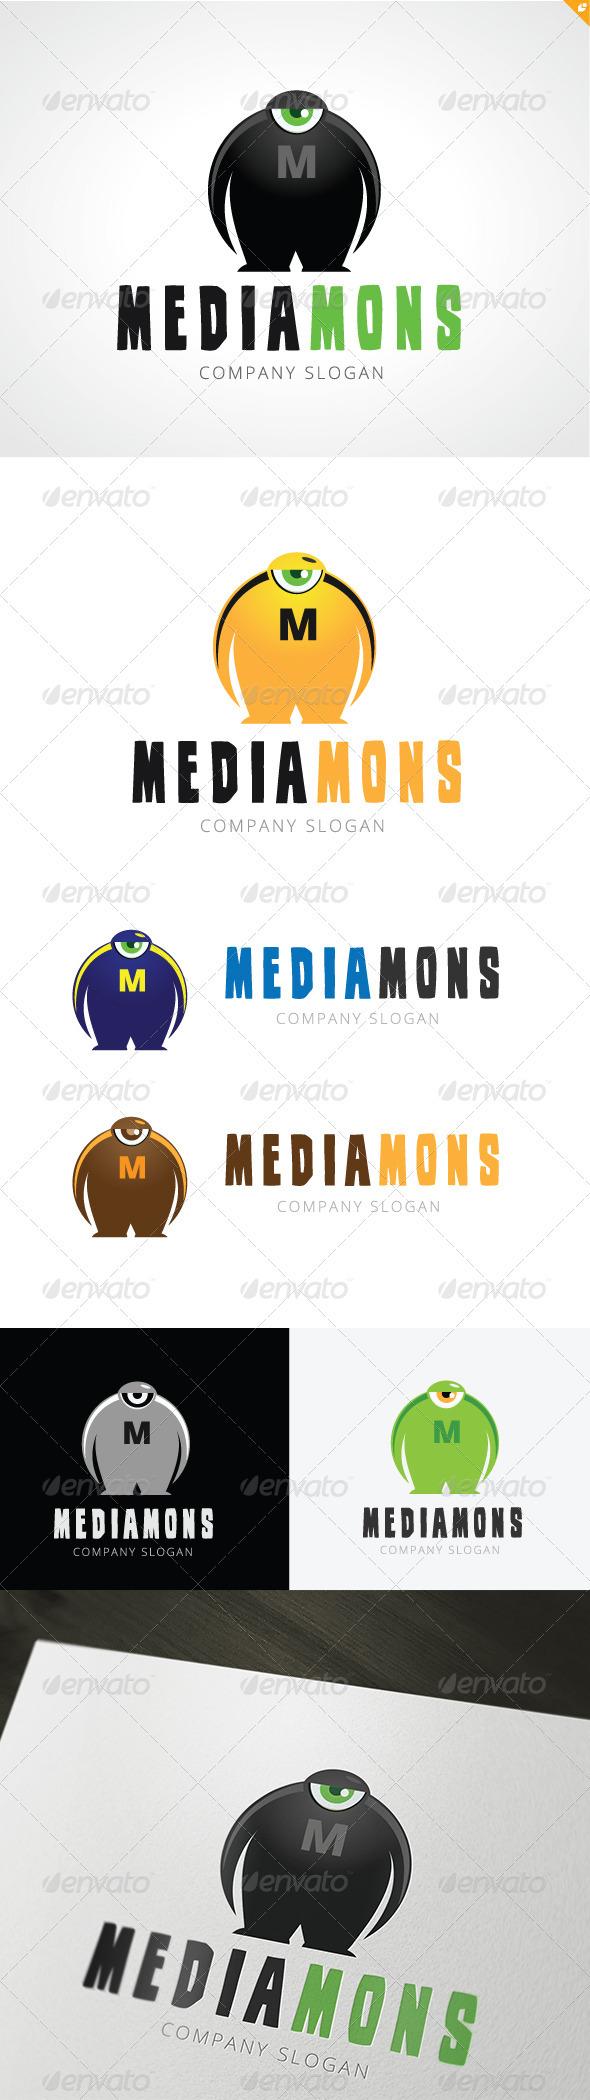 GraphicRiver Mediamons Logo 3686337